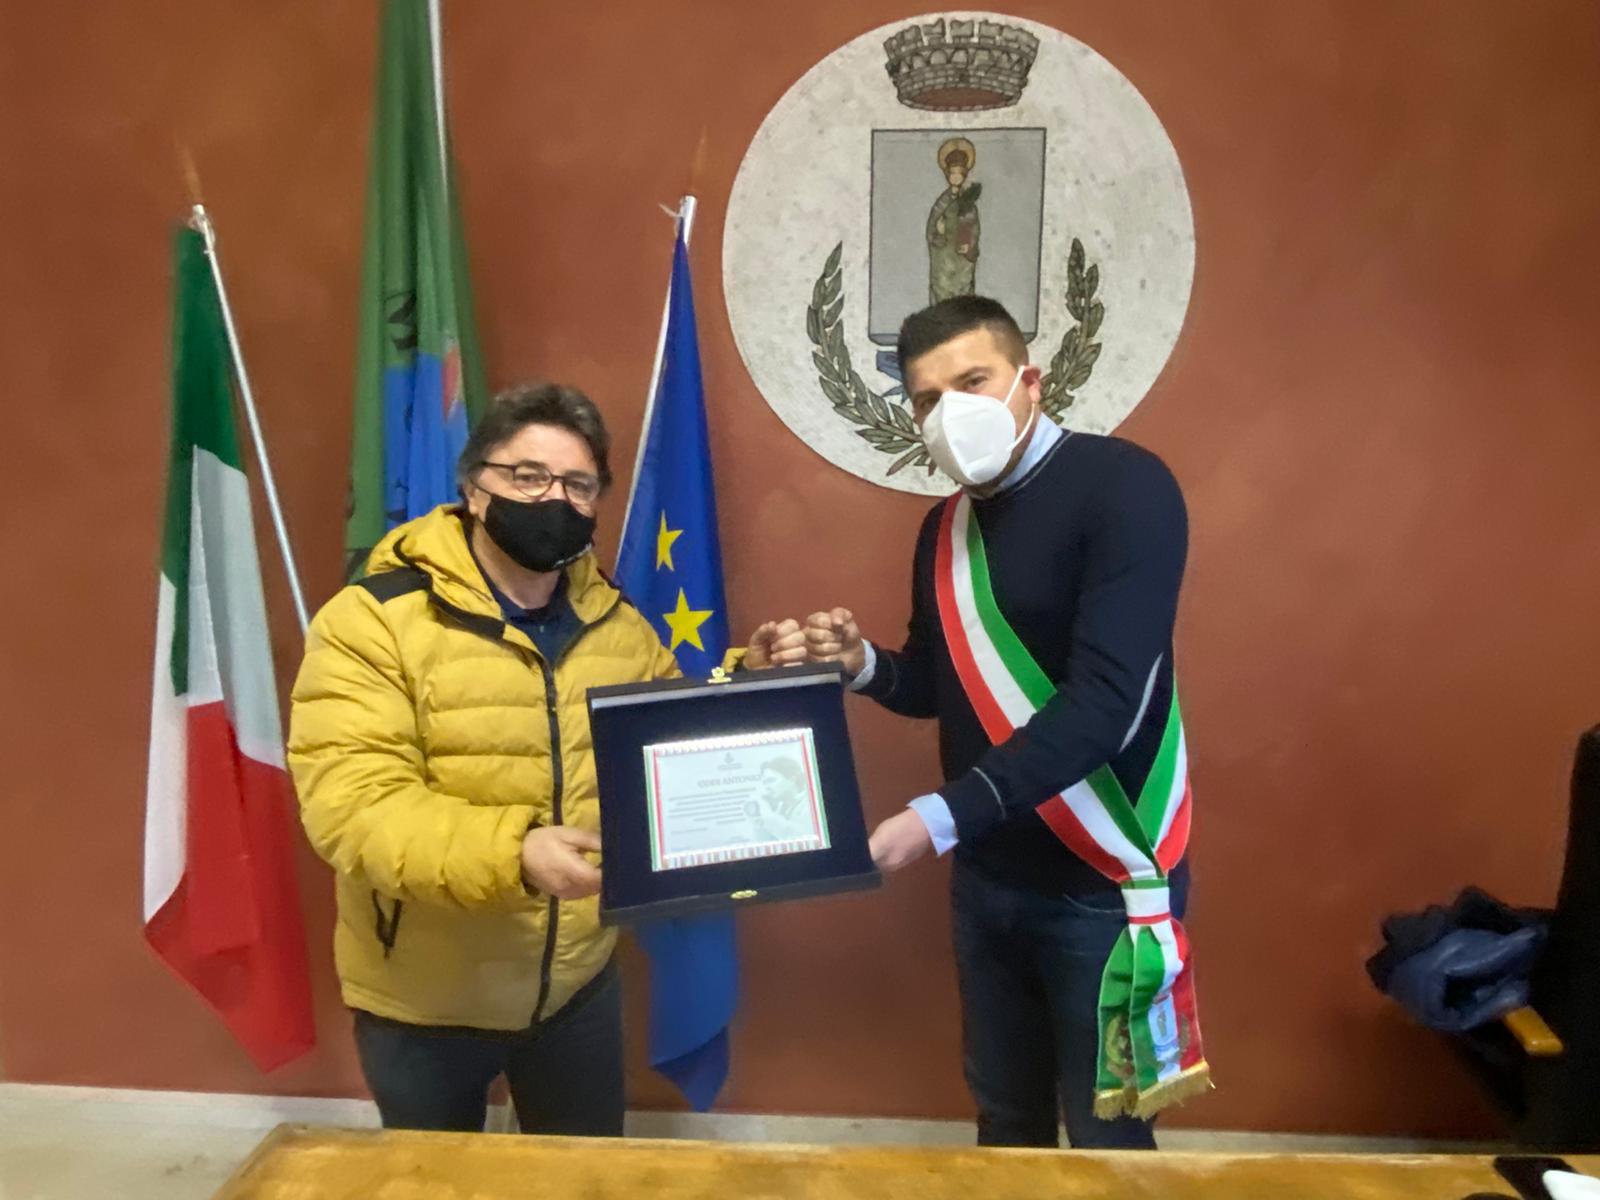 Il fotoreporter Oddi riceve una targa dal sindaco di Trasacco